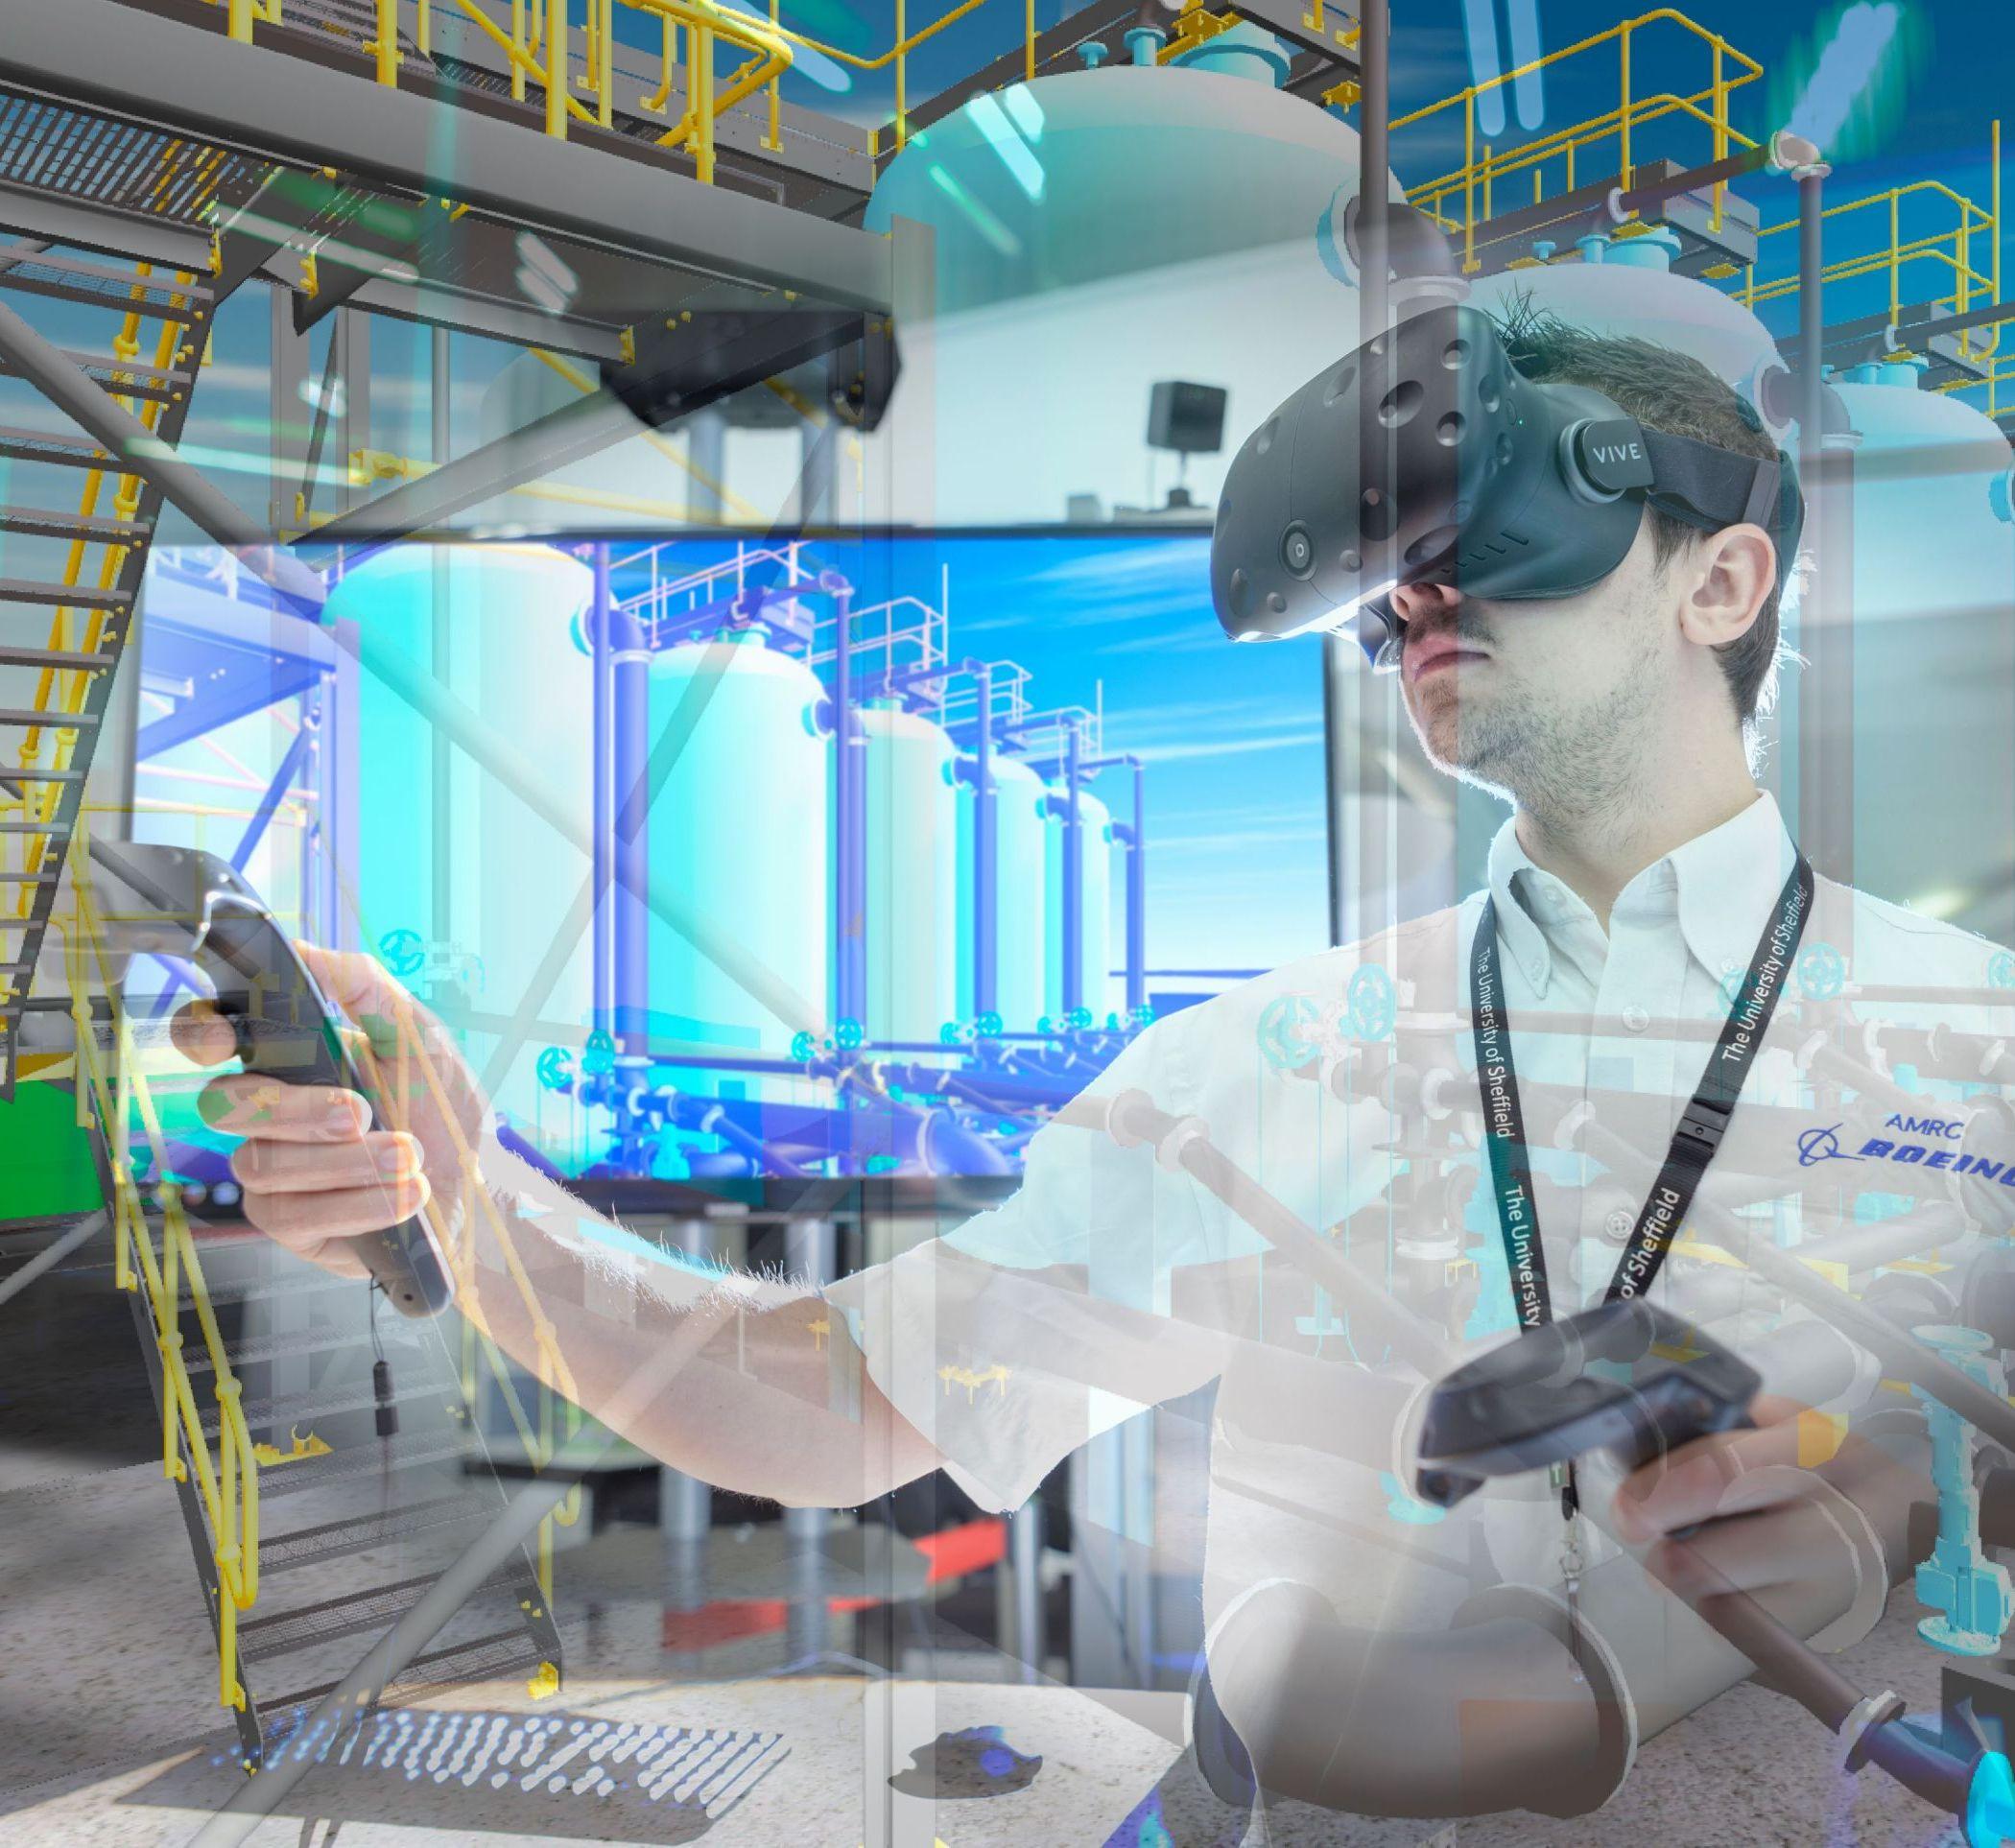 Man using VR equipment